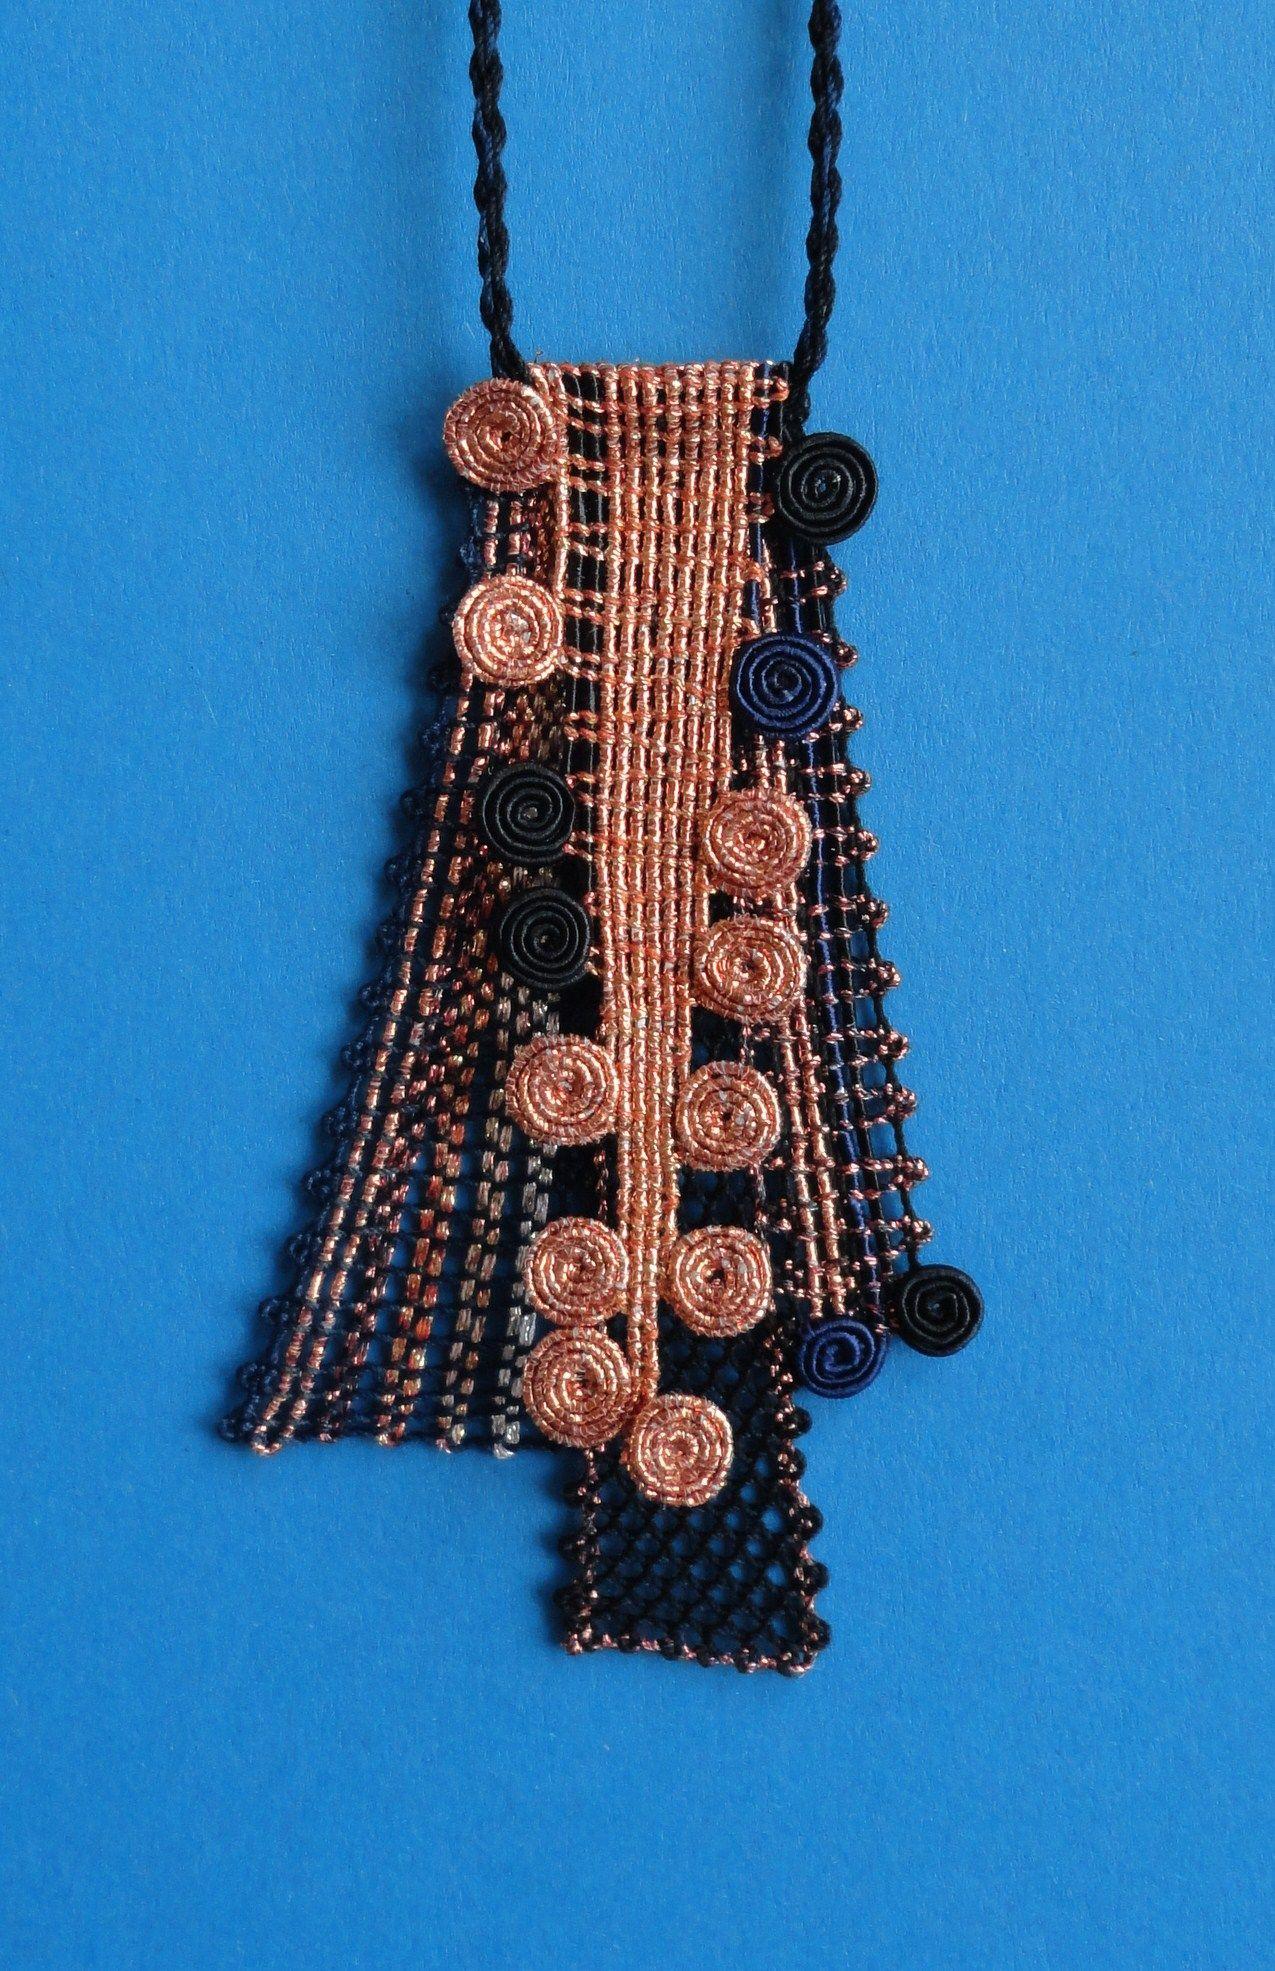 Šperky s gympou